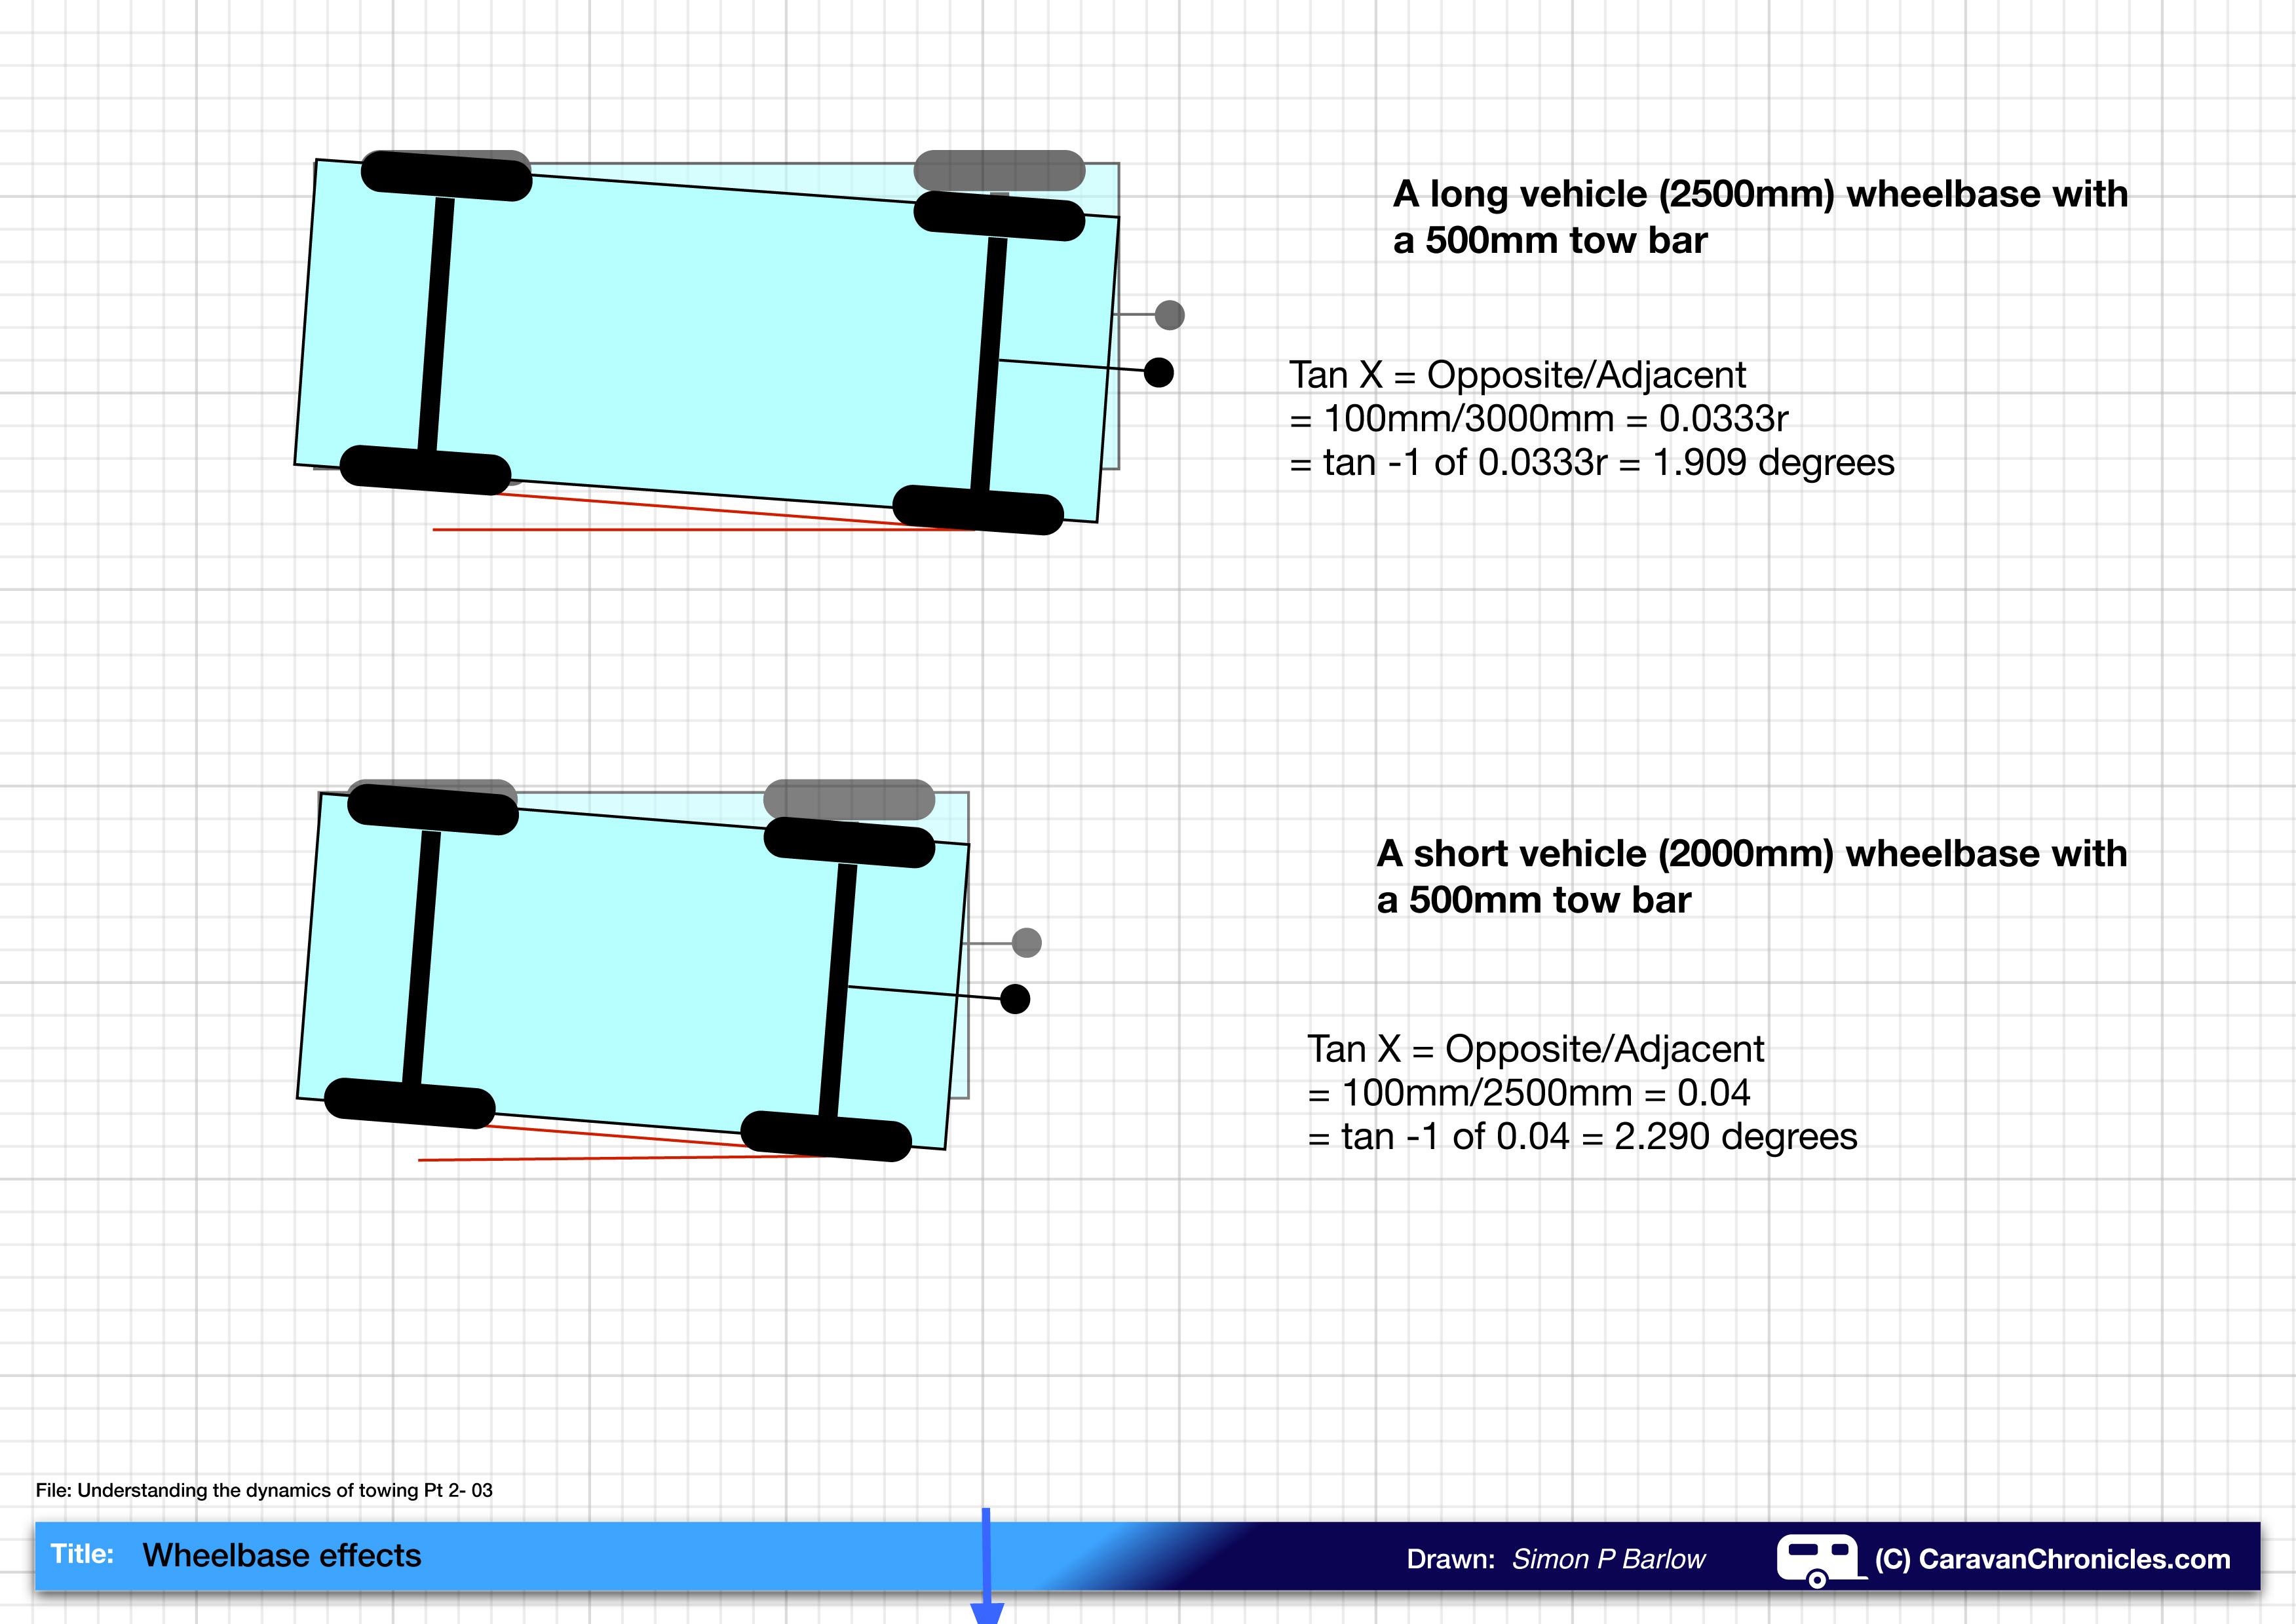 understanding the dynamics of towing \u2013 pt 2 caravan chroniclesclick on image to enlarge